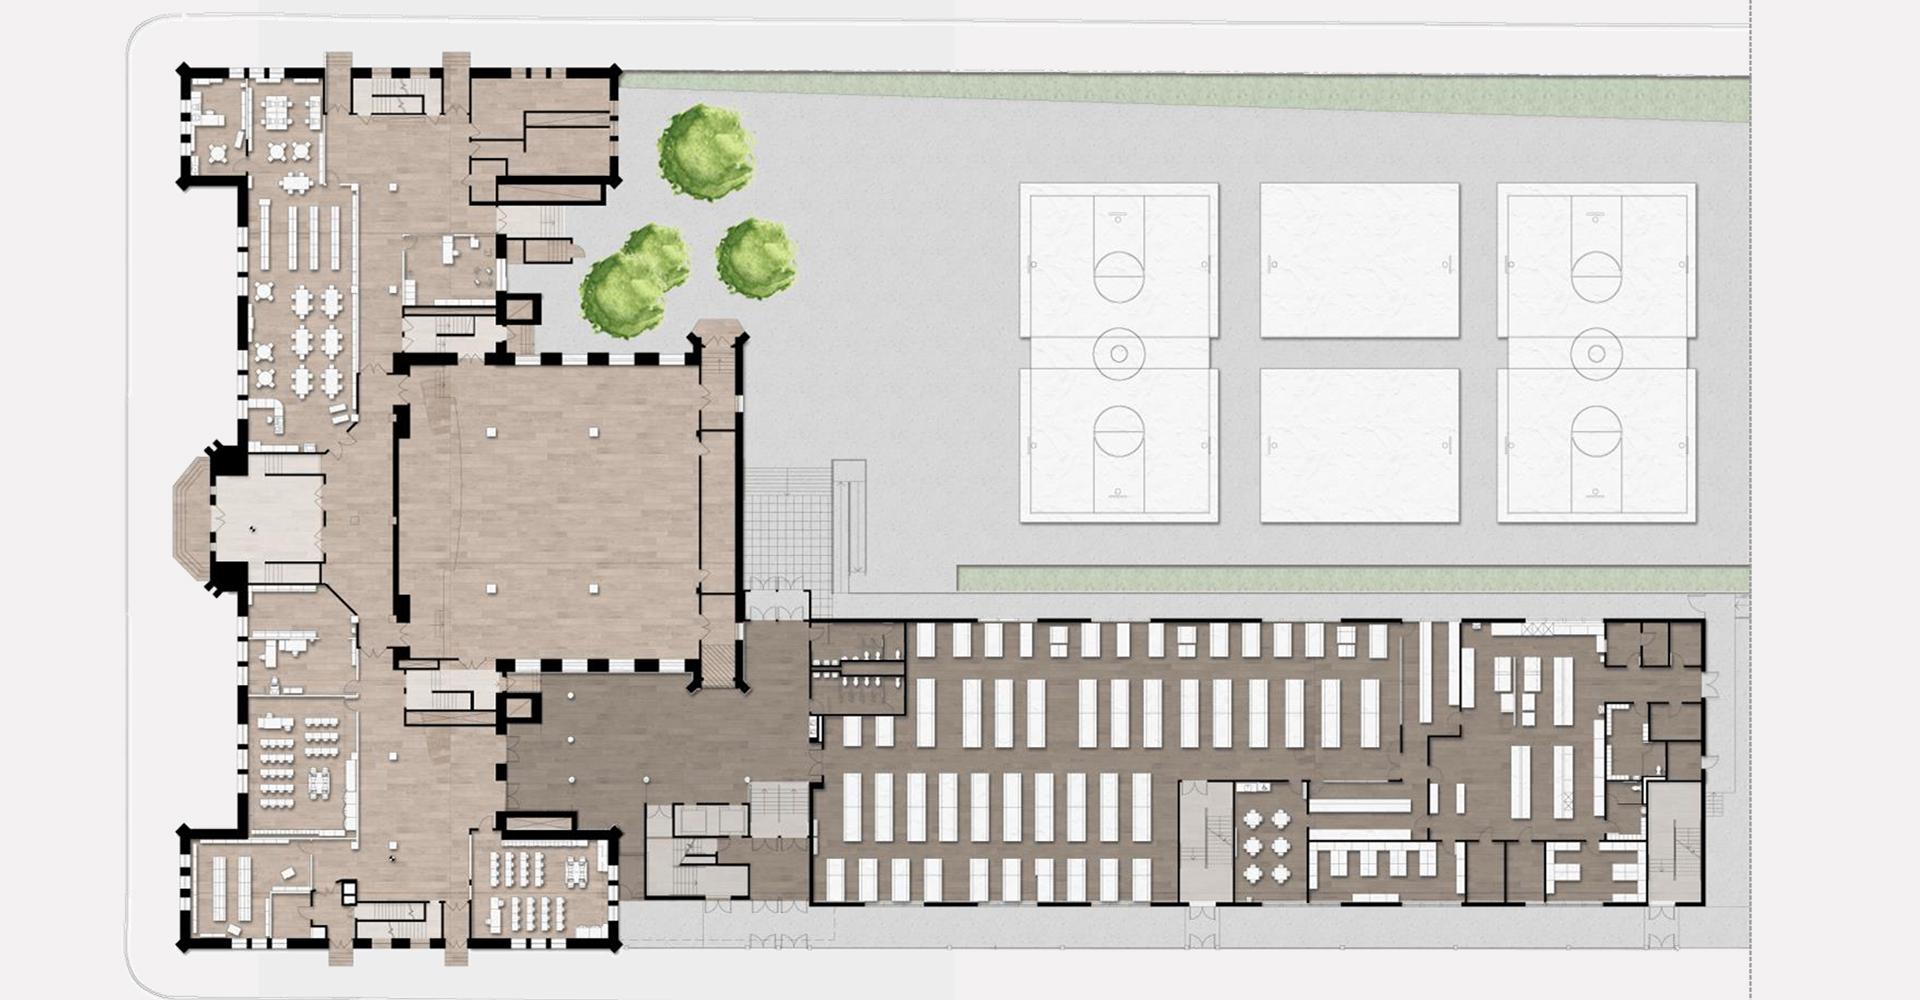 I.S. 77Q Plan.jpg